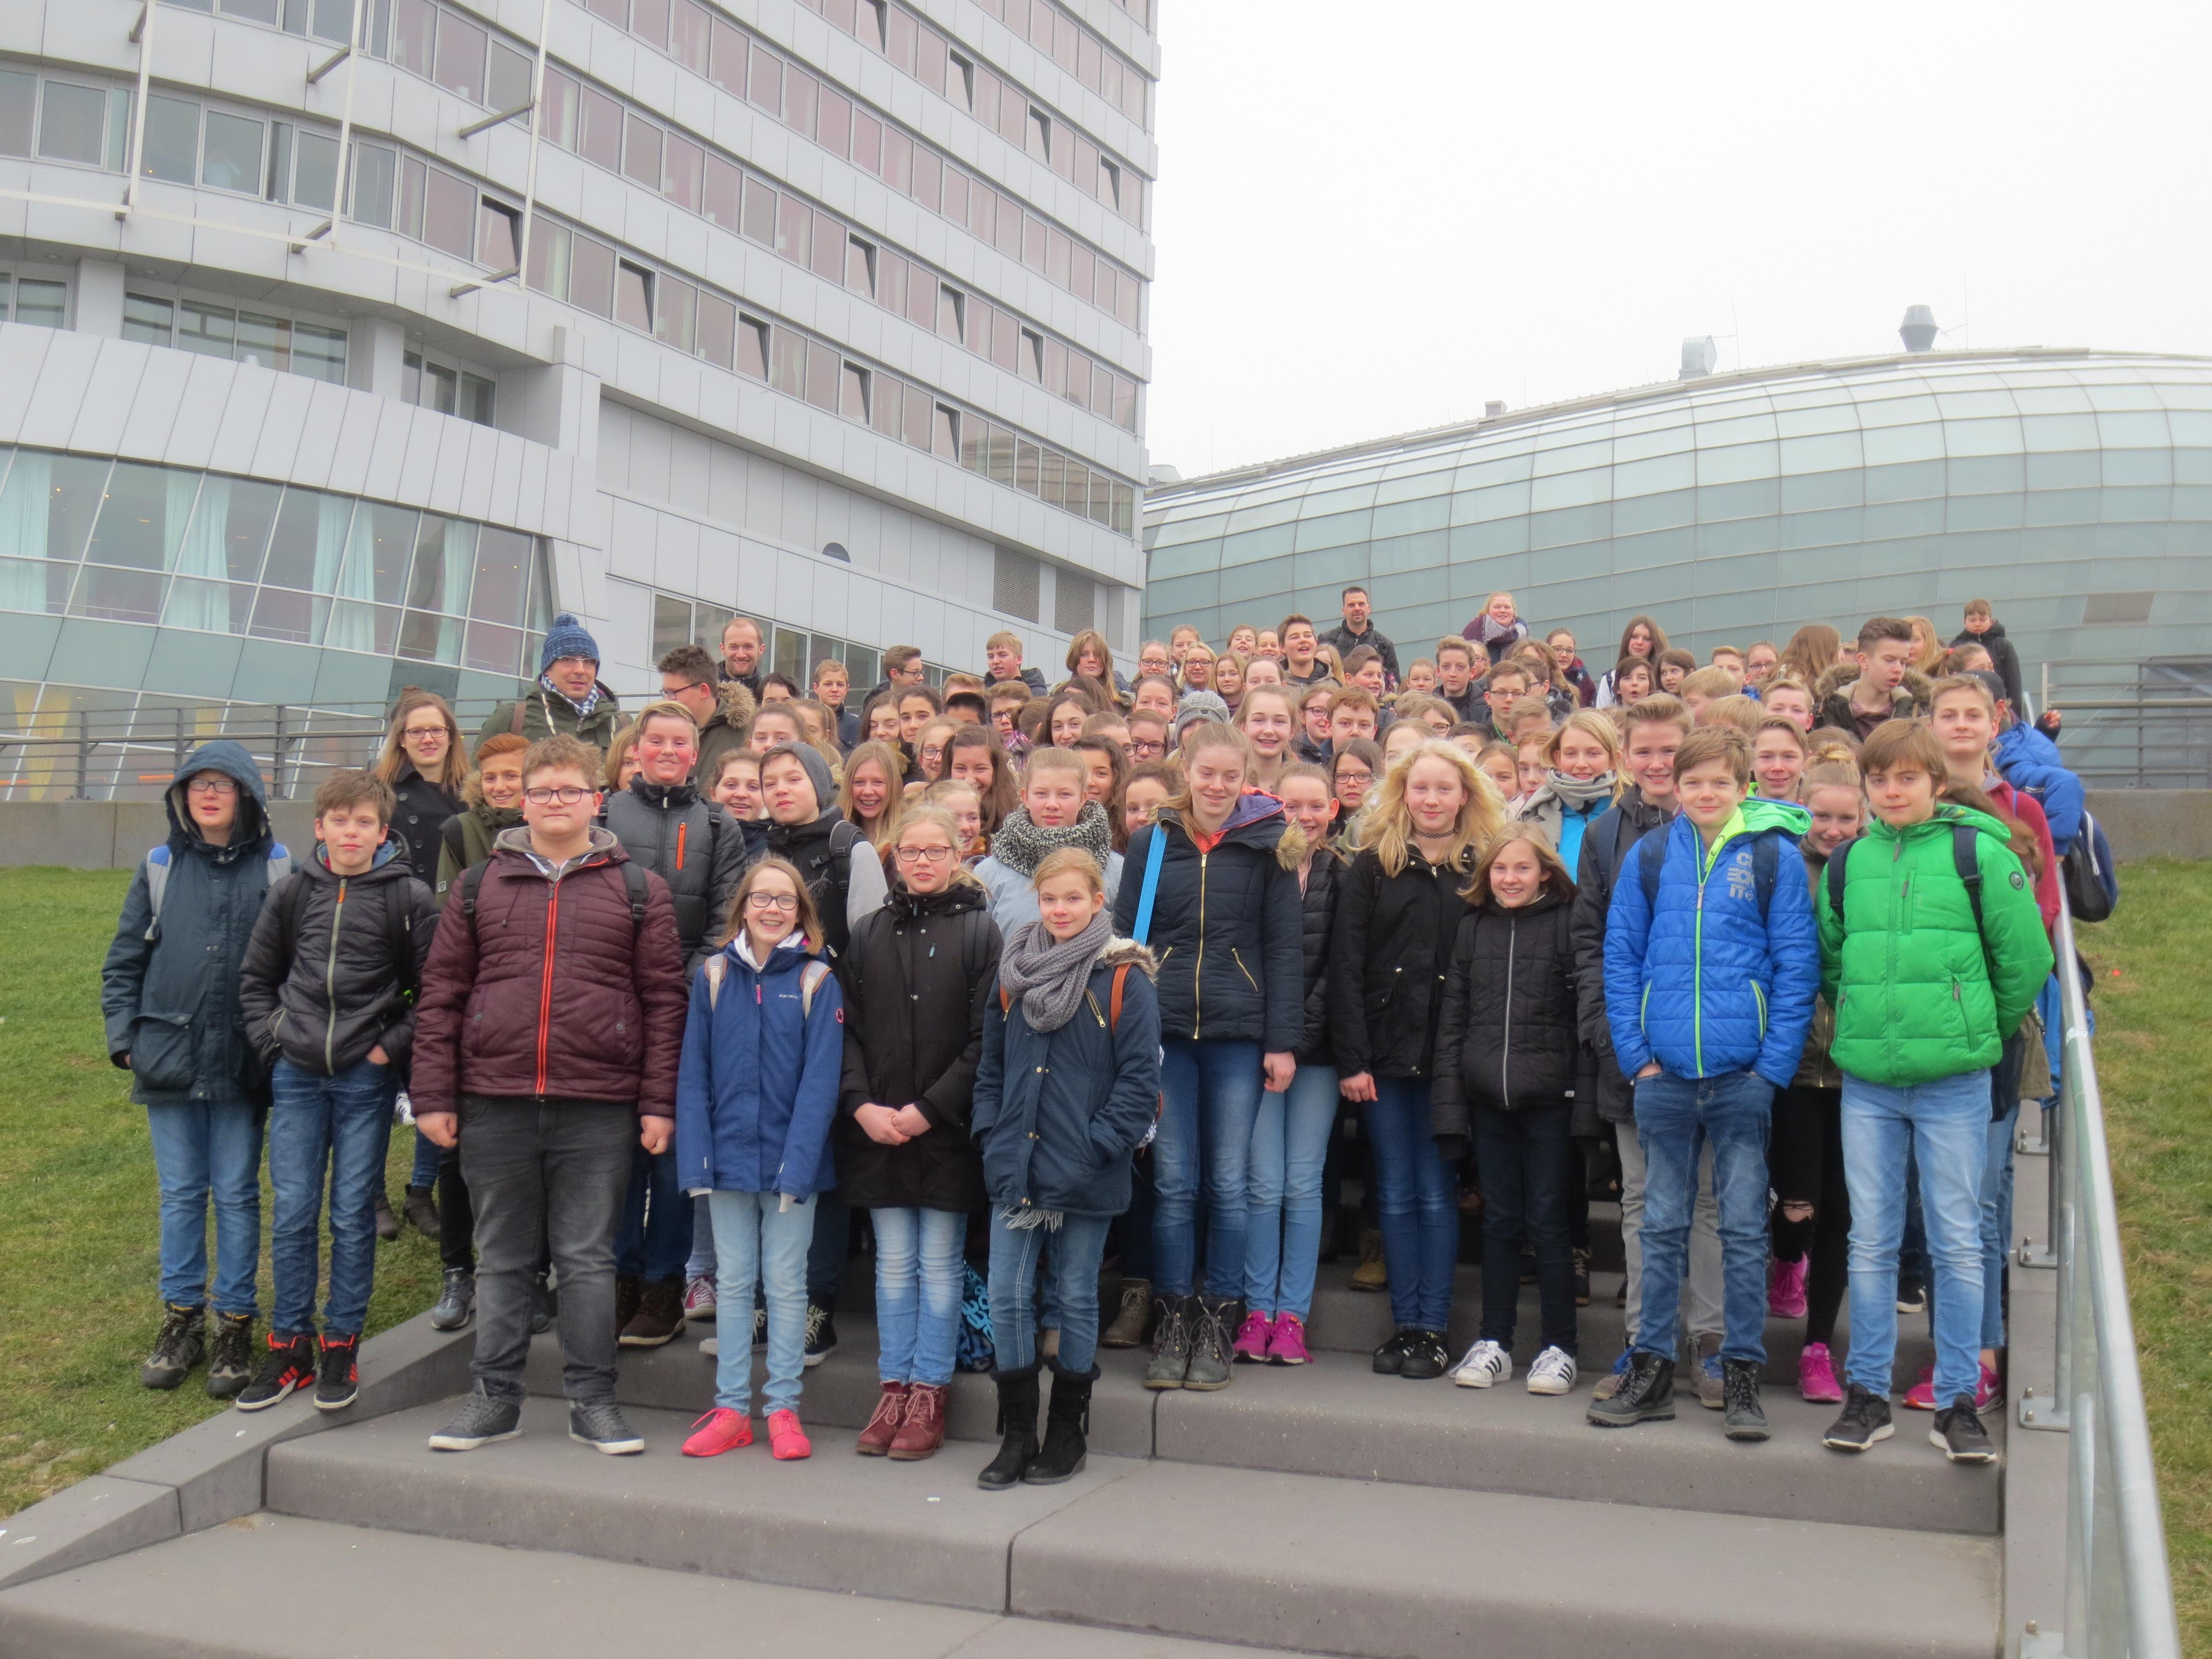 Unser Besuch des Klimahauses Bremerhaven 8° Ost